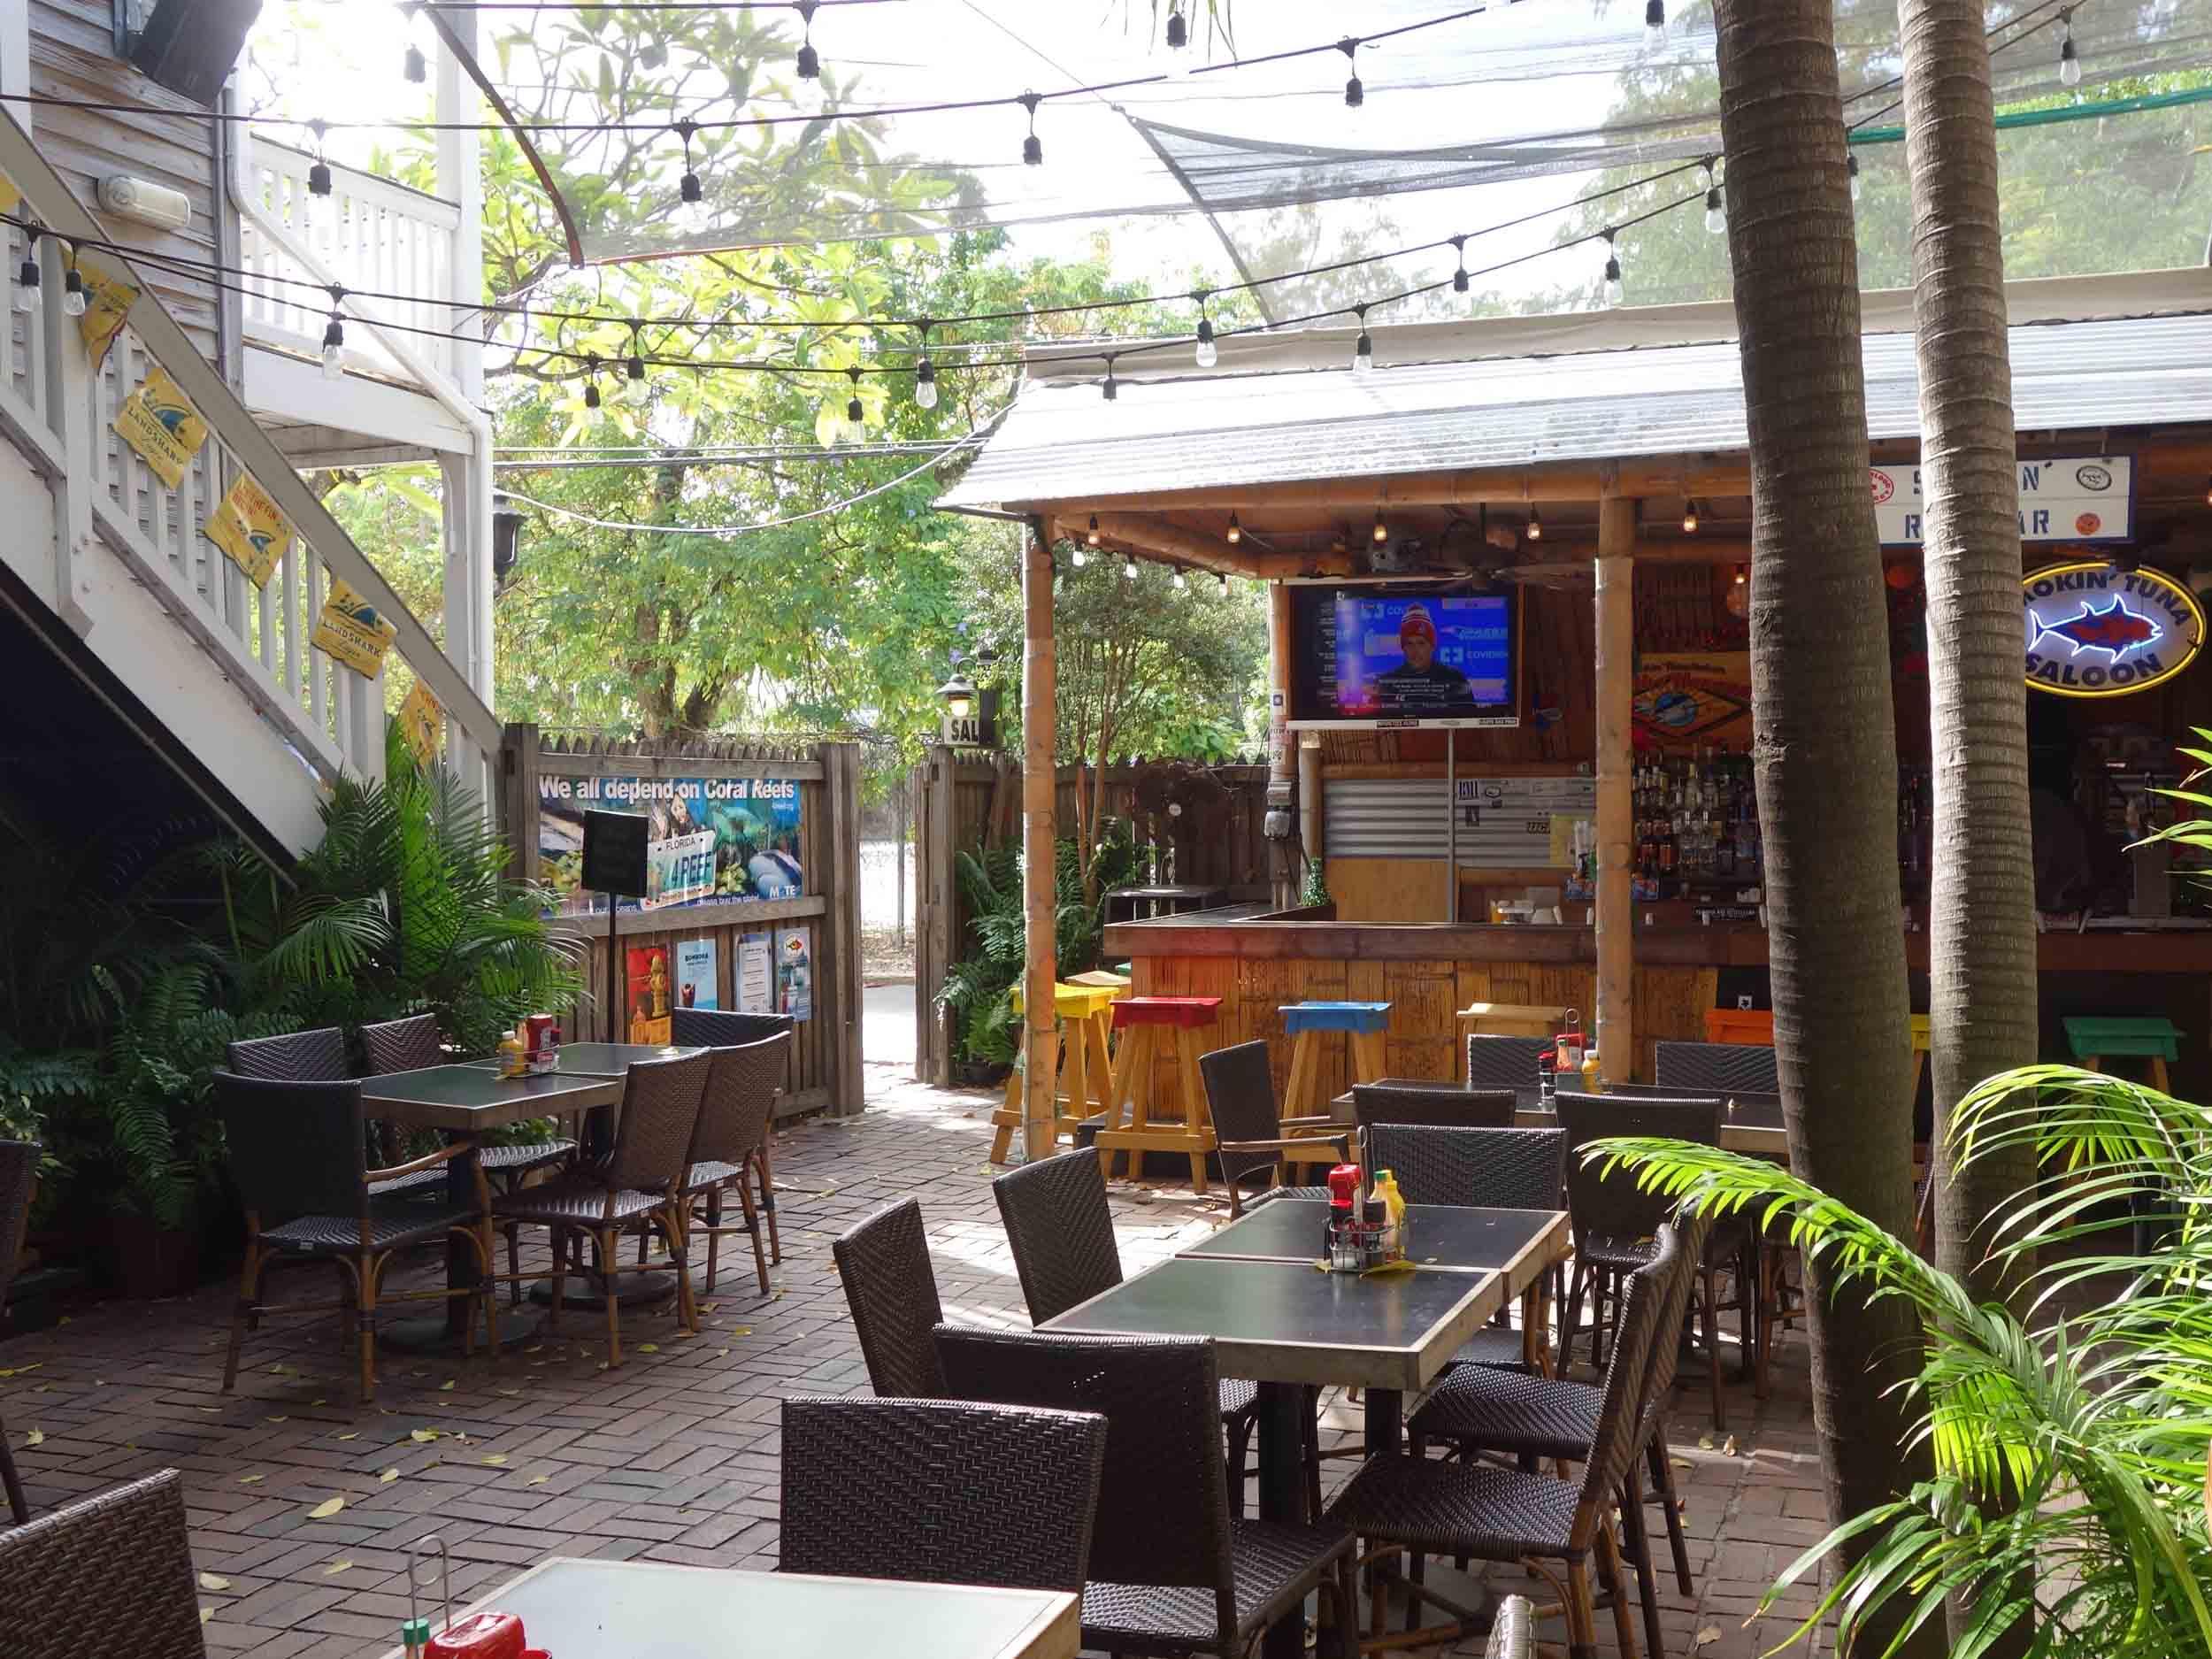 Smokin' Tuna Saloon Outdoor Seating Area